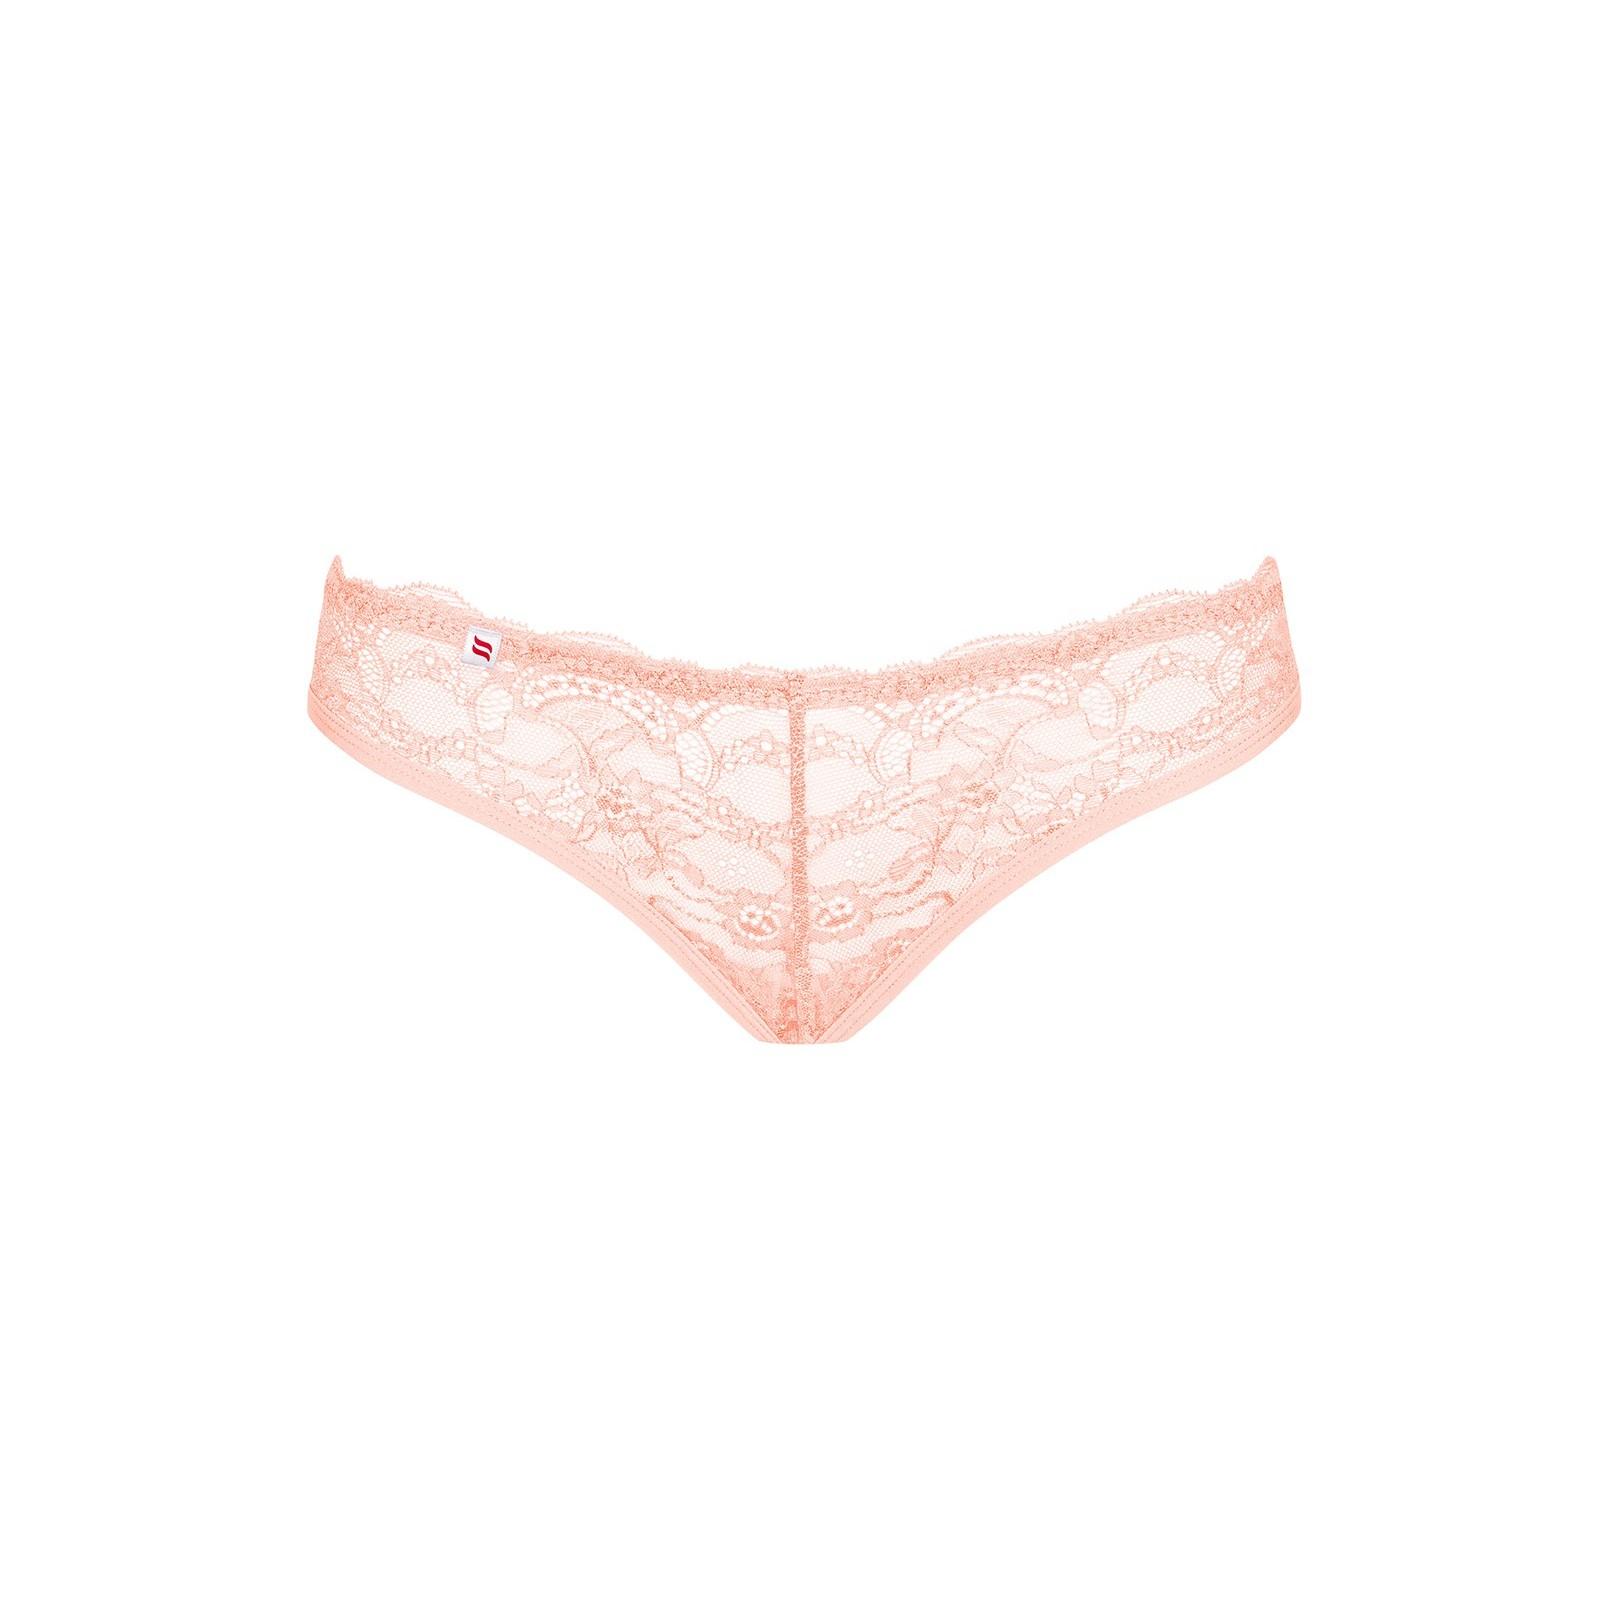 Frivolla Panties pink - 5 - Vorschaubild